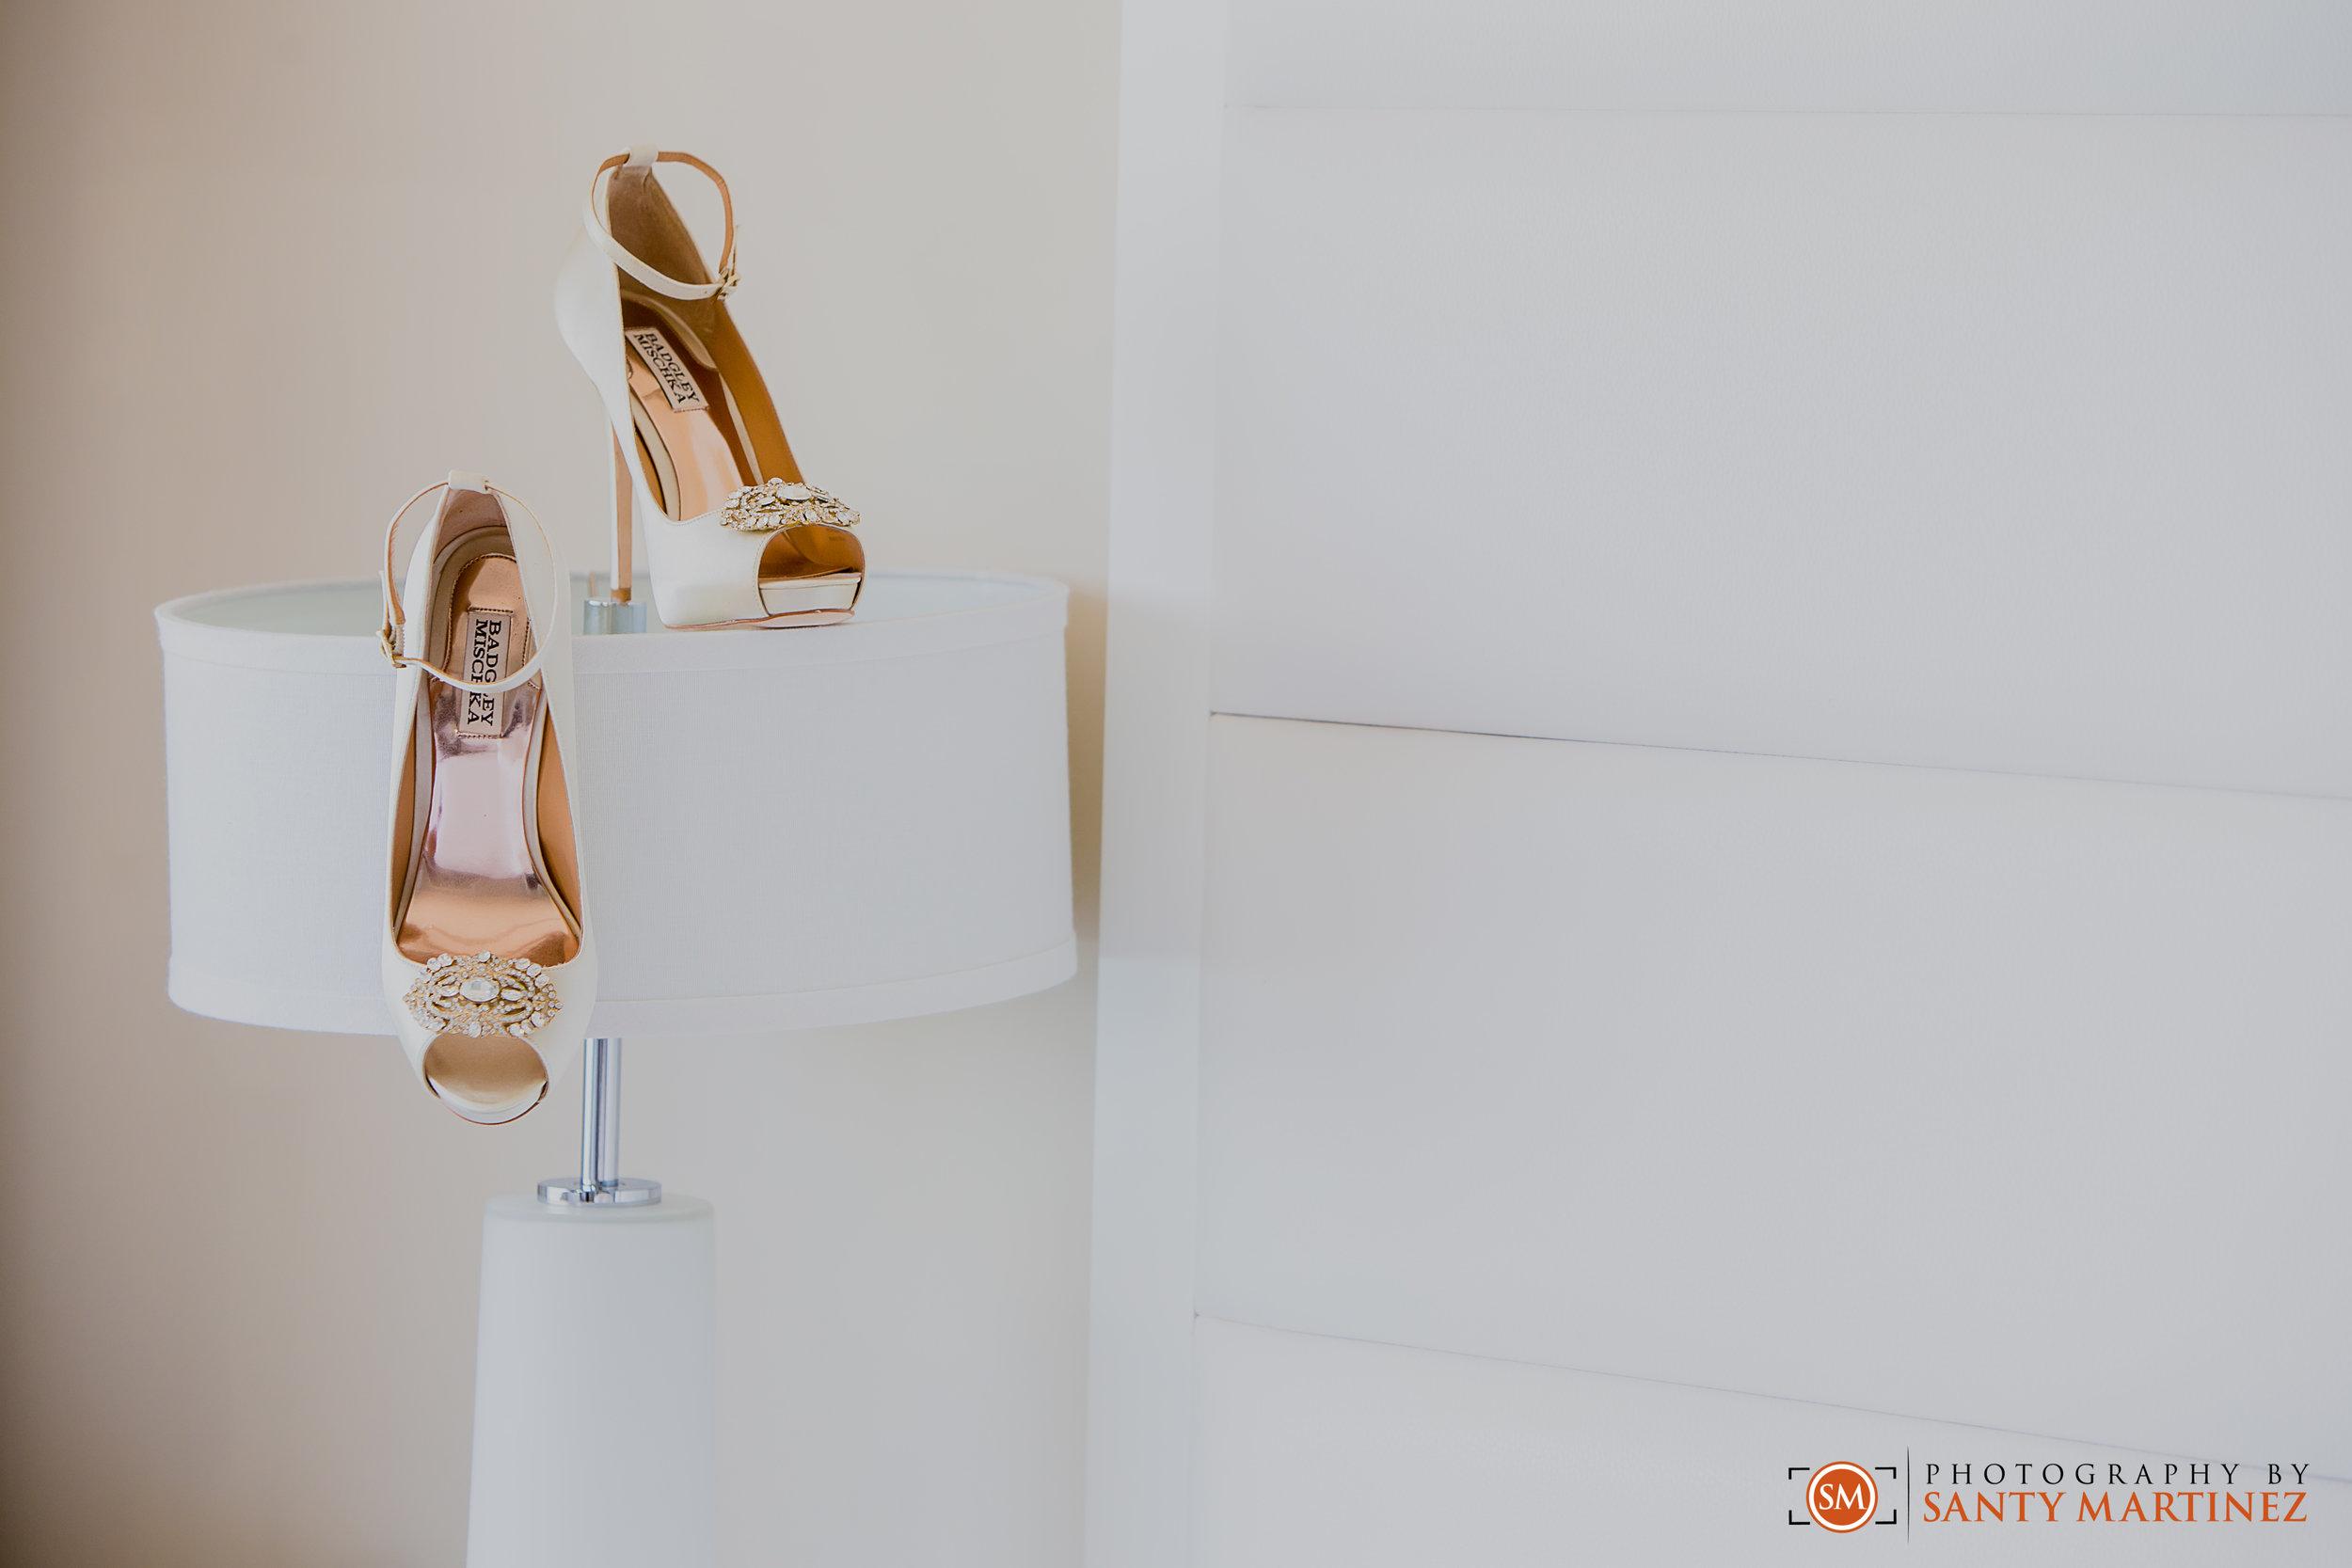 Miami Wedding Photographer - Santy Martinez.jpg